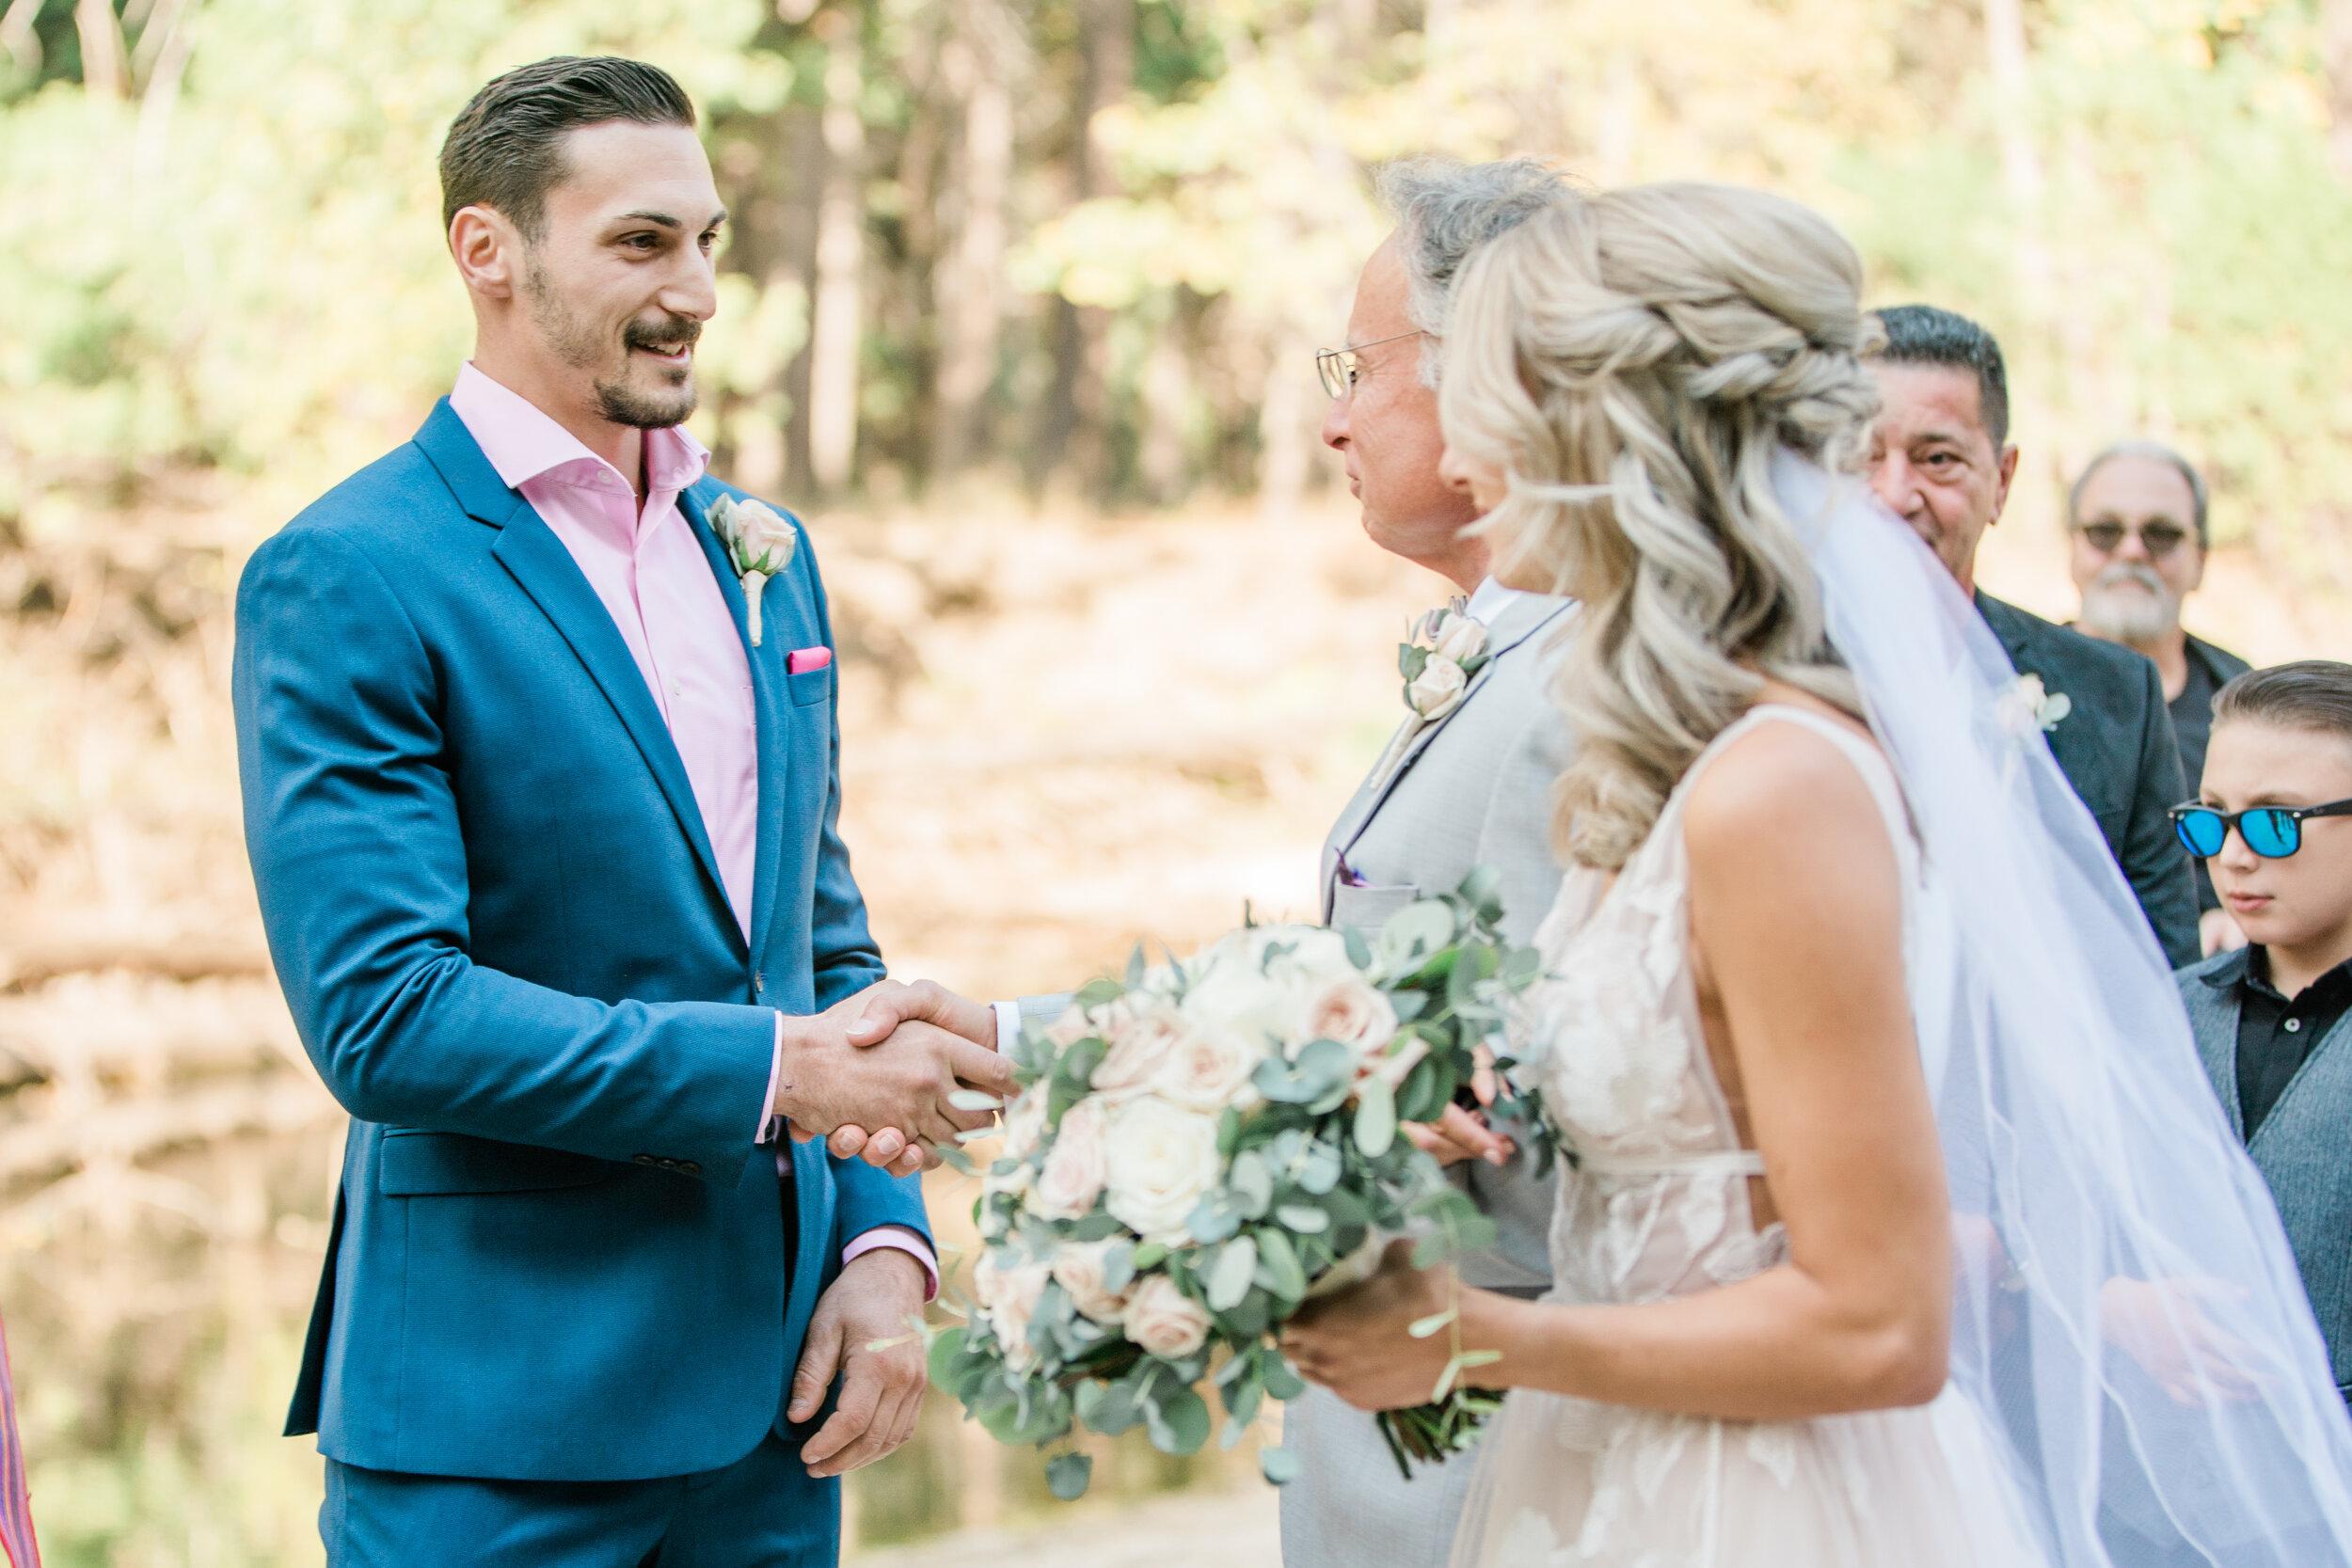 Leanne and Joe - Married - Sneak Peeks - Lauren Alisse Photography-15.jpg